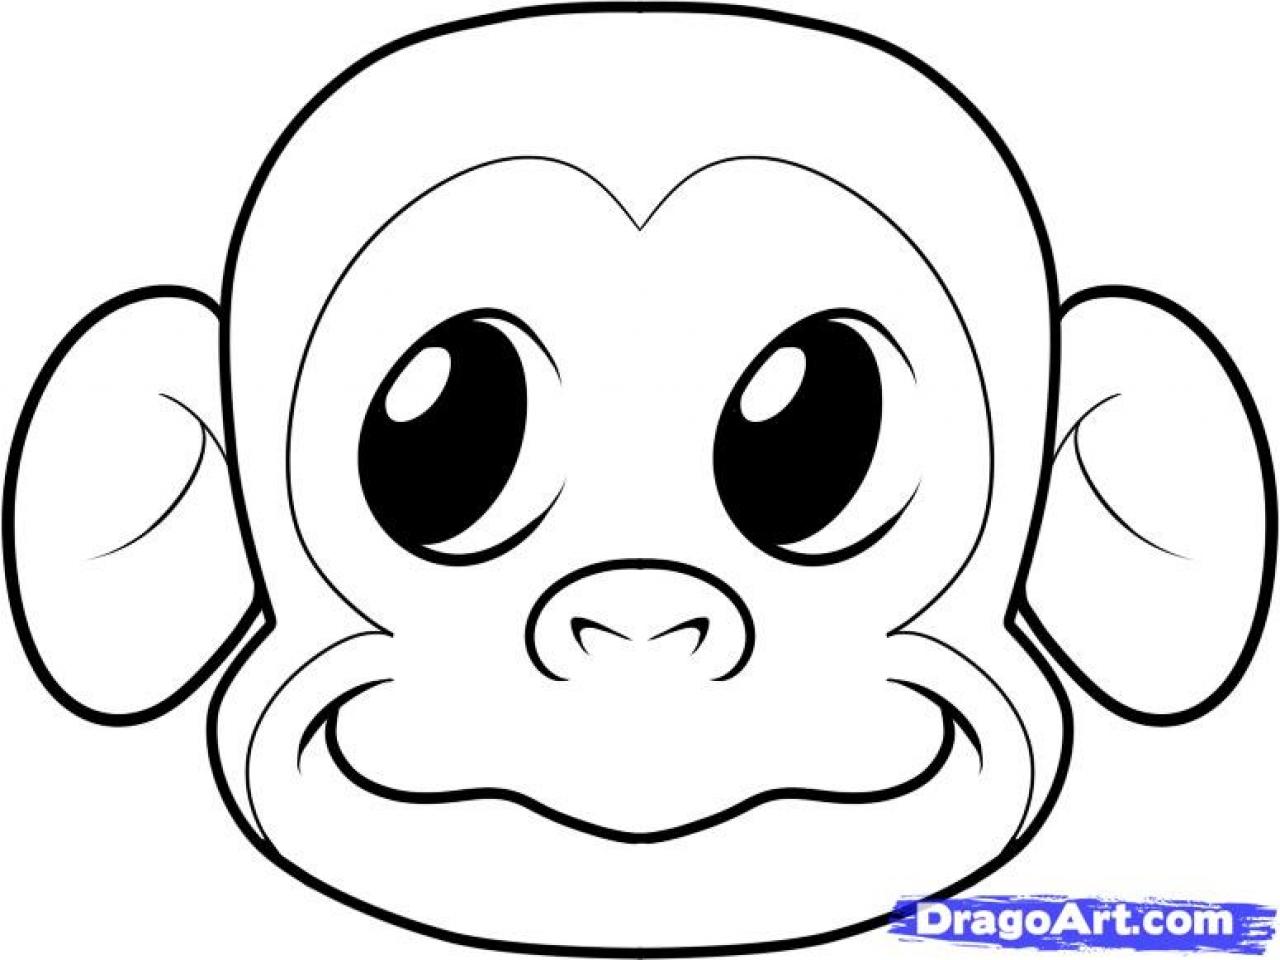 Easy Gorilla Drawing At Getdrawings